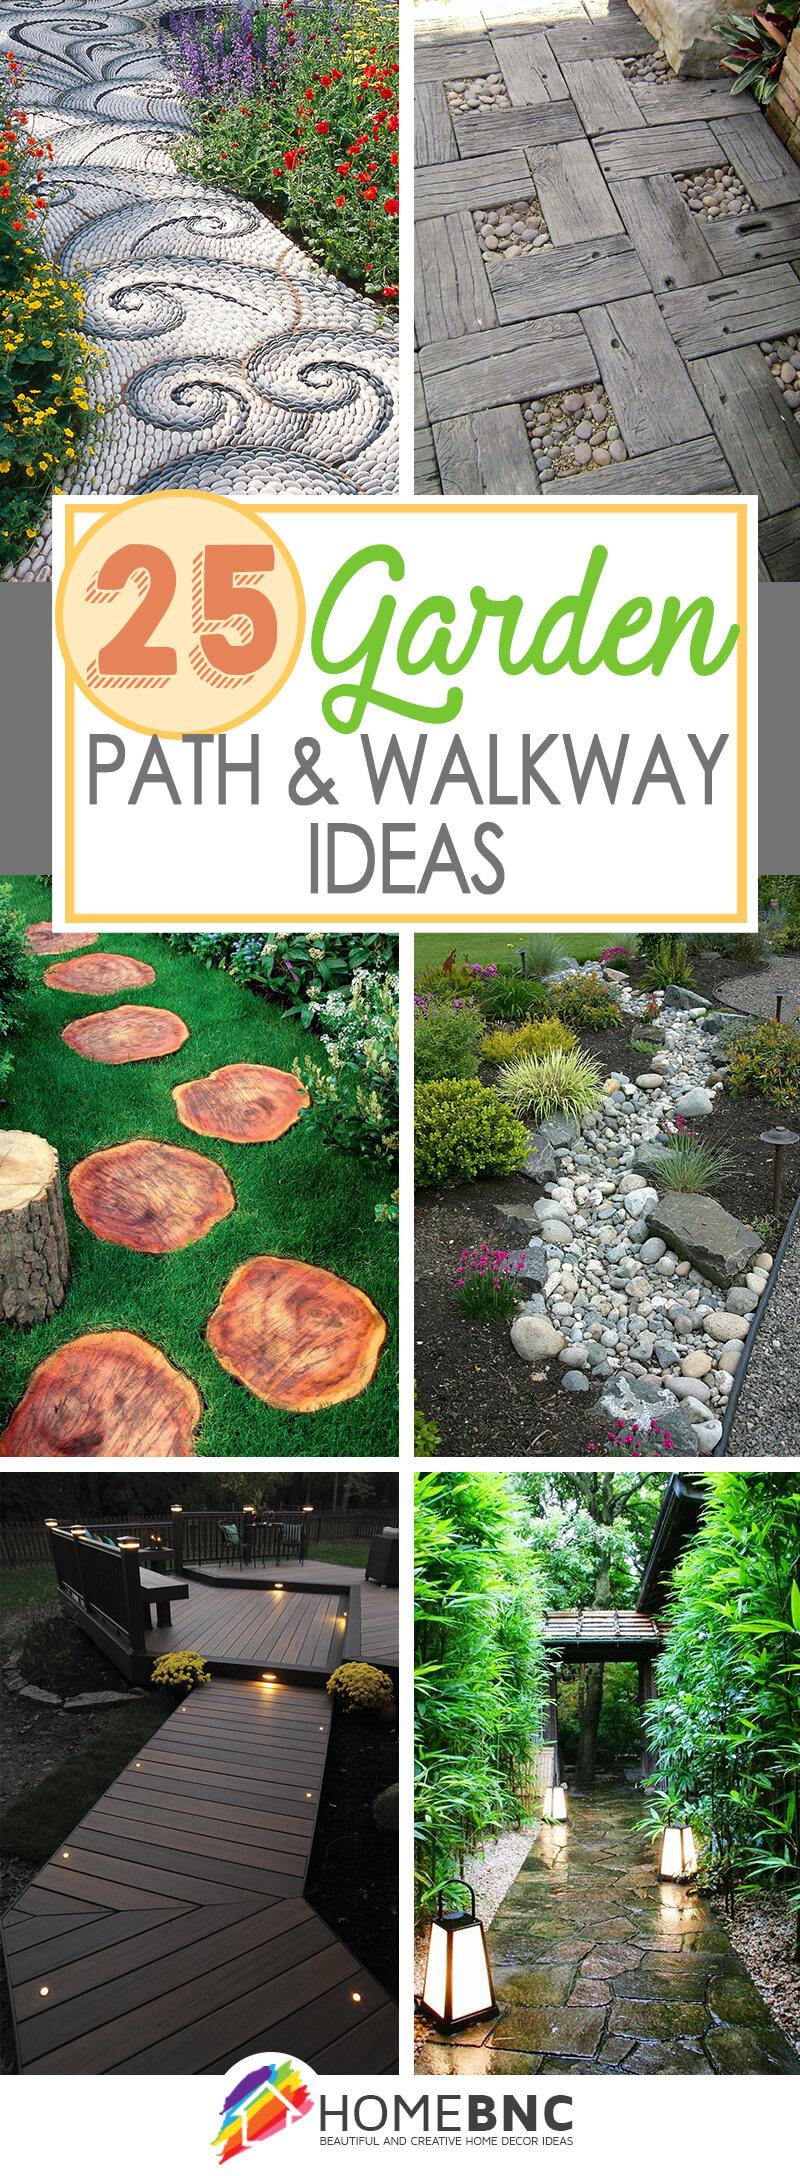 Garden Path and Walkway Designs